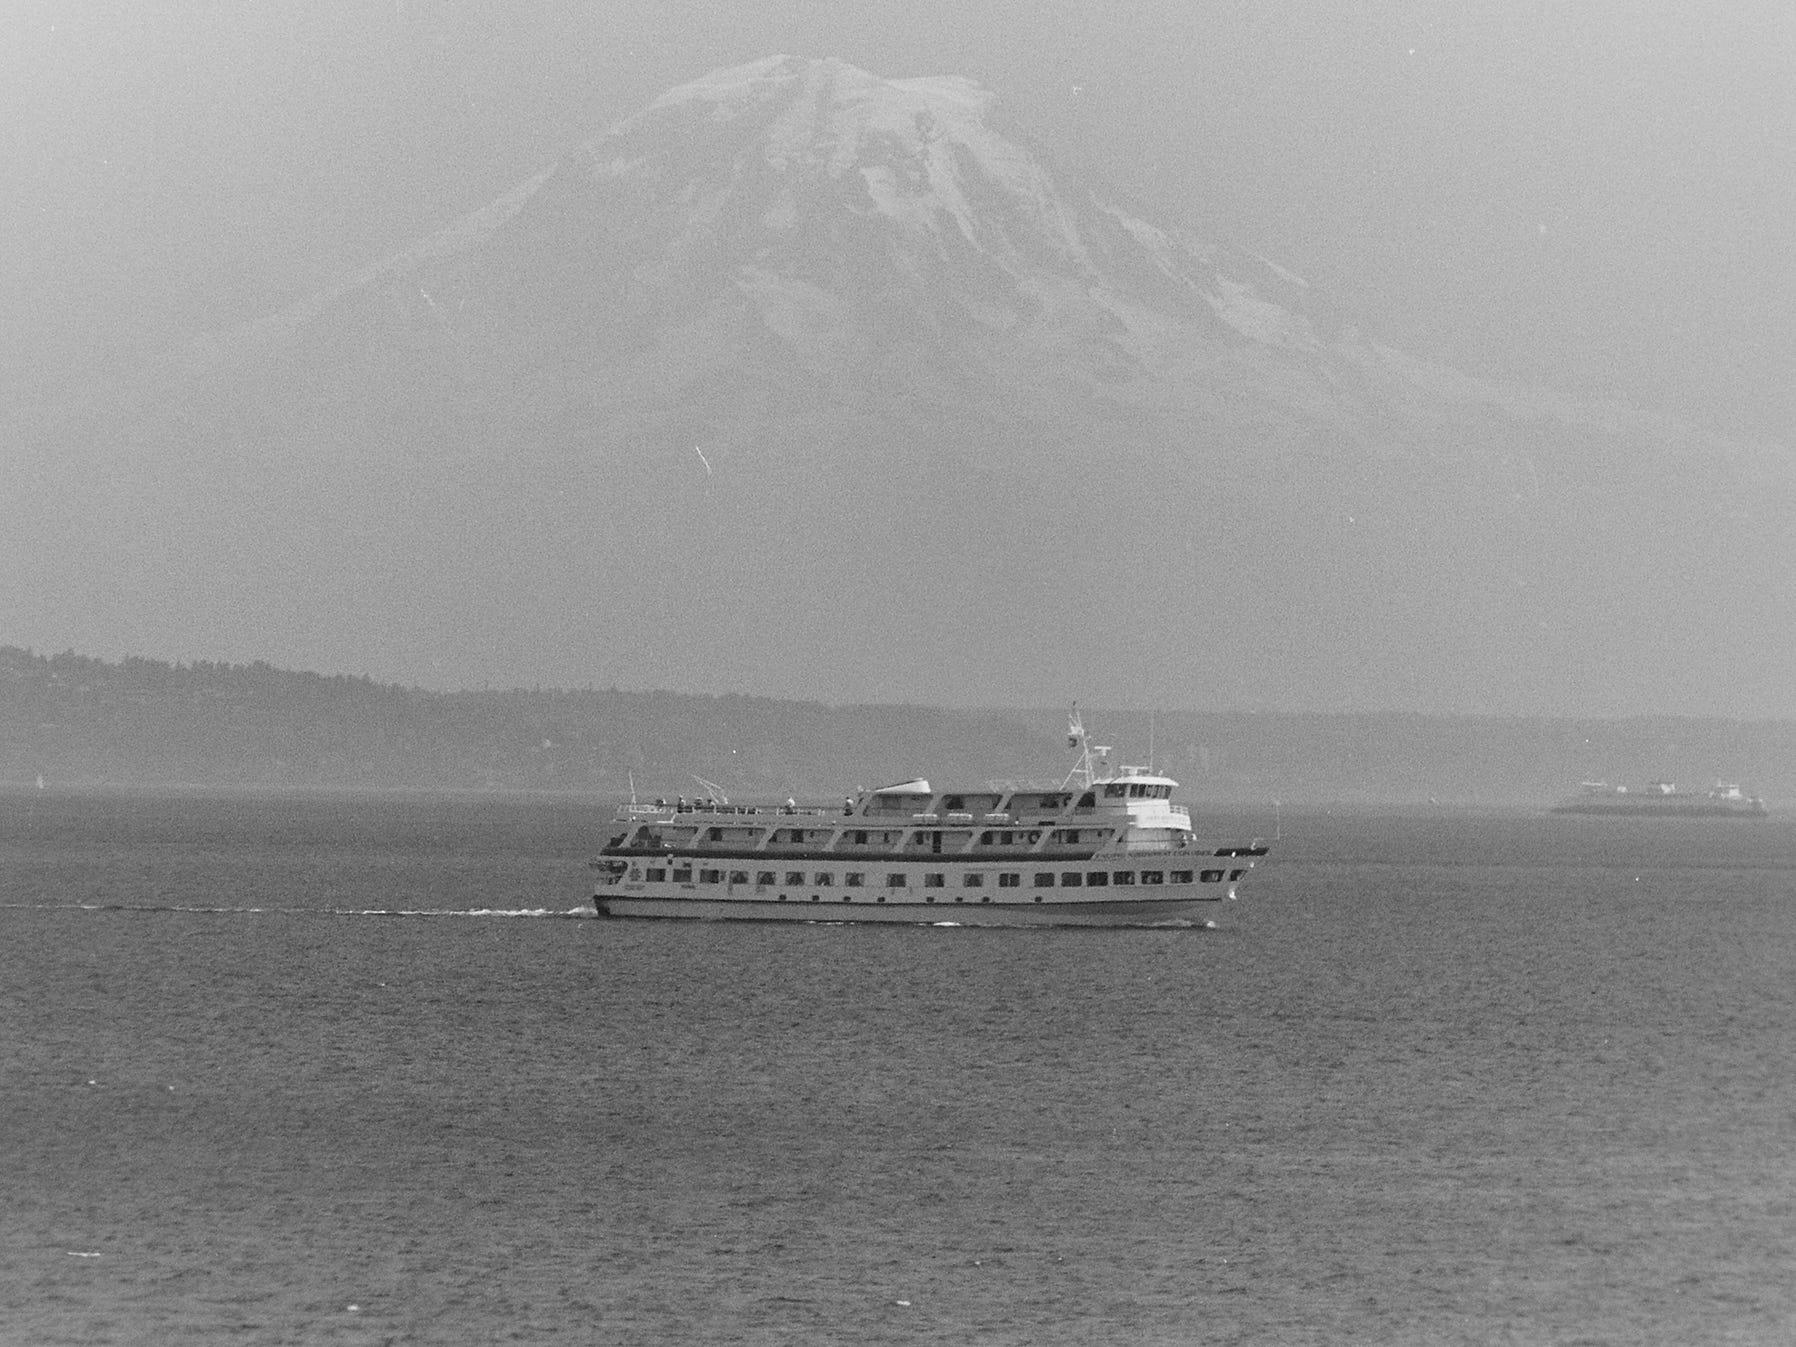 08/24/82 Rainier and Ferry